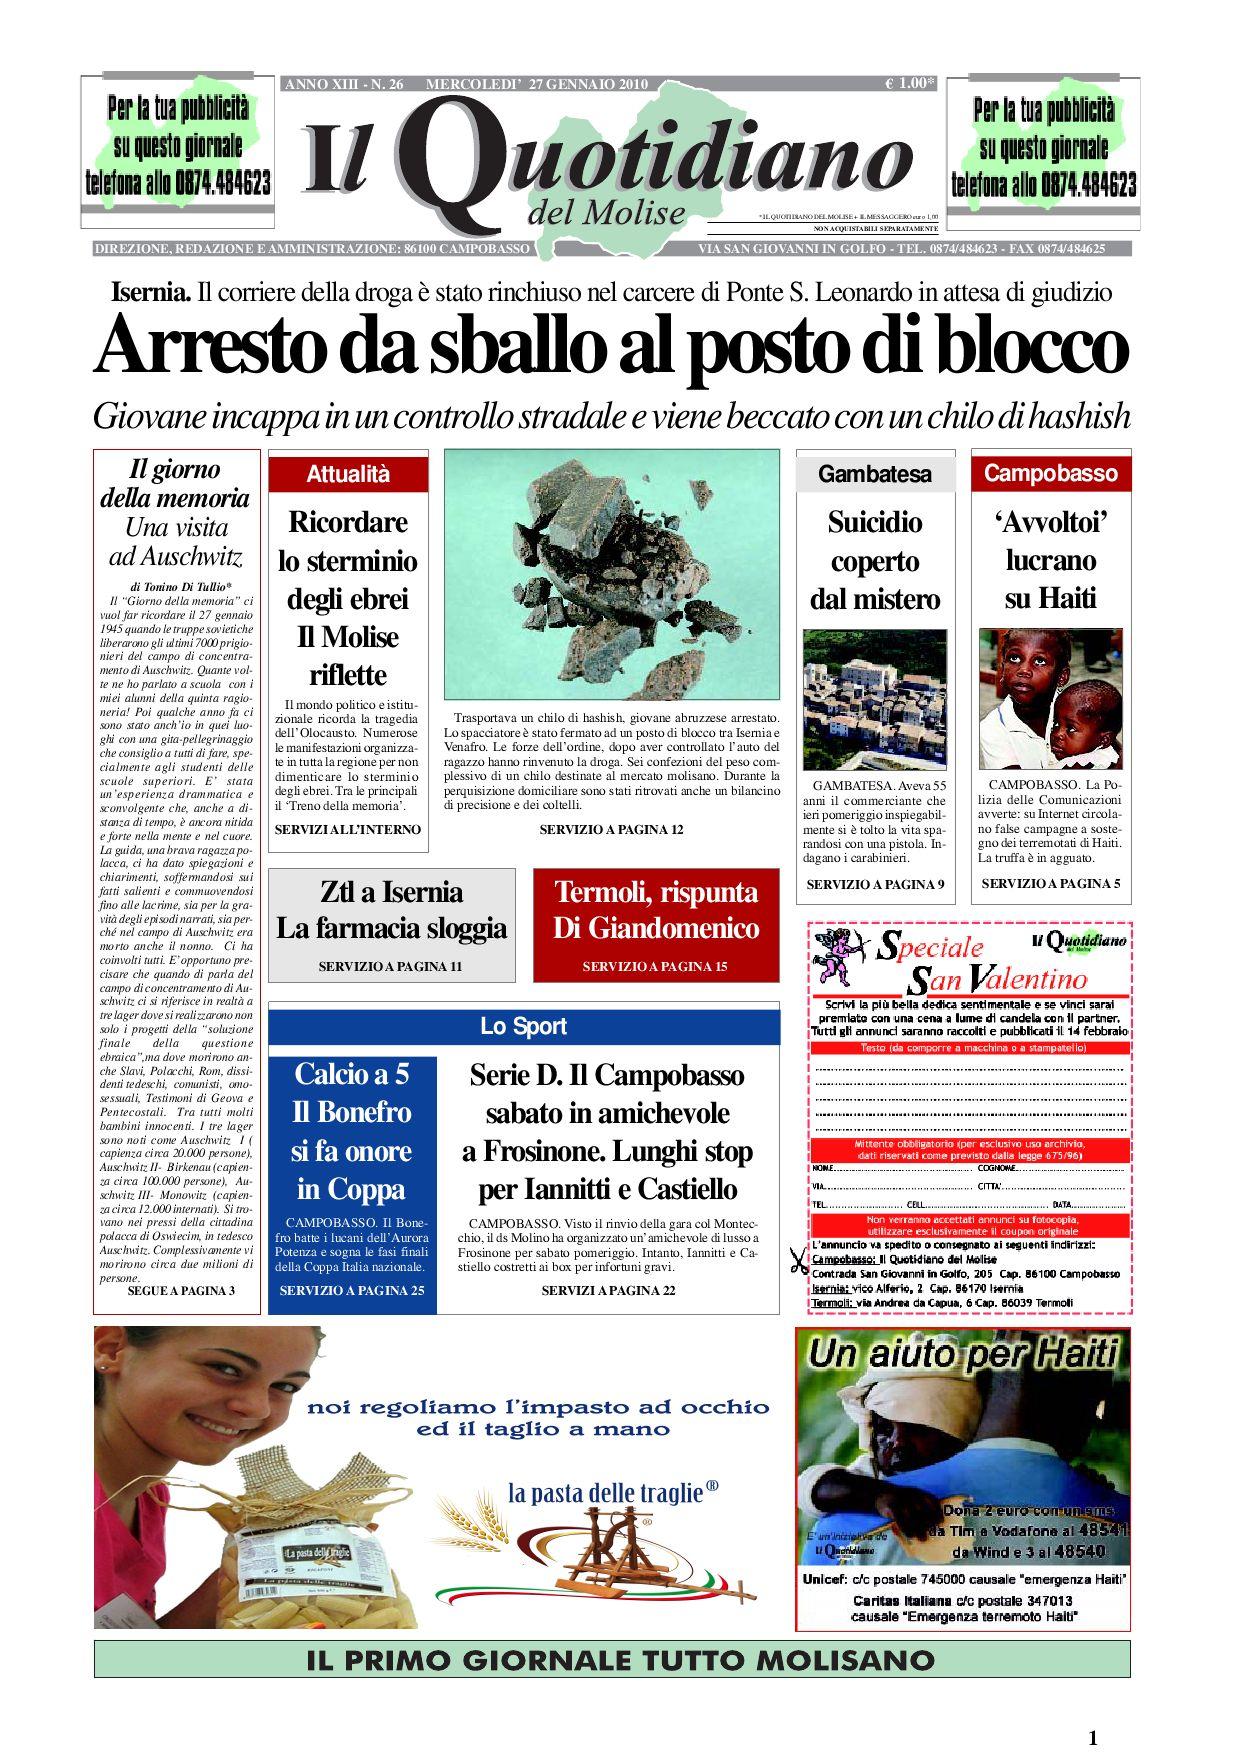 e99653949ad5d5 quotidianomolise 27-01 by giovanni testa - issuu